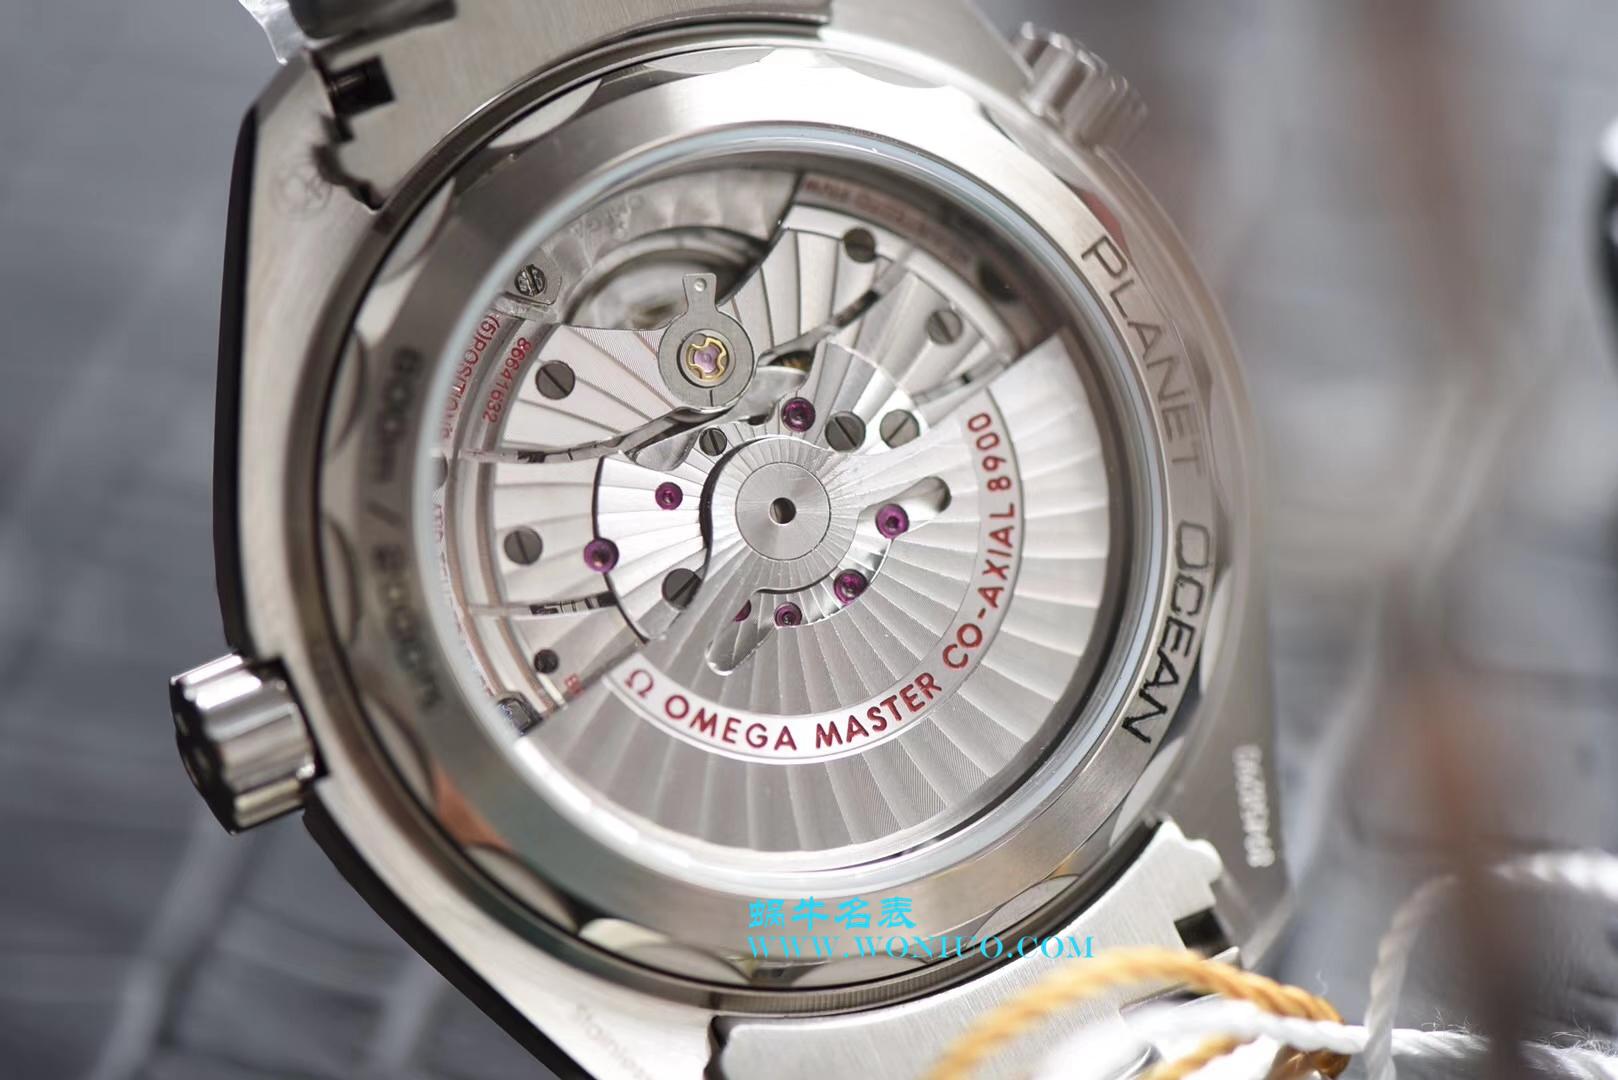 【OM一比一超A高仿手表】欧米茄海马 海洋宇宙600米系列232.30.46.21.01.001、232.32.46.21.01.003腕表 / M318